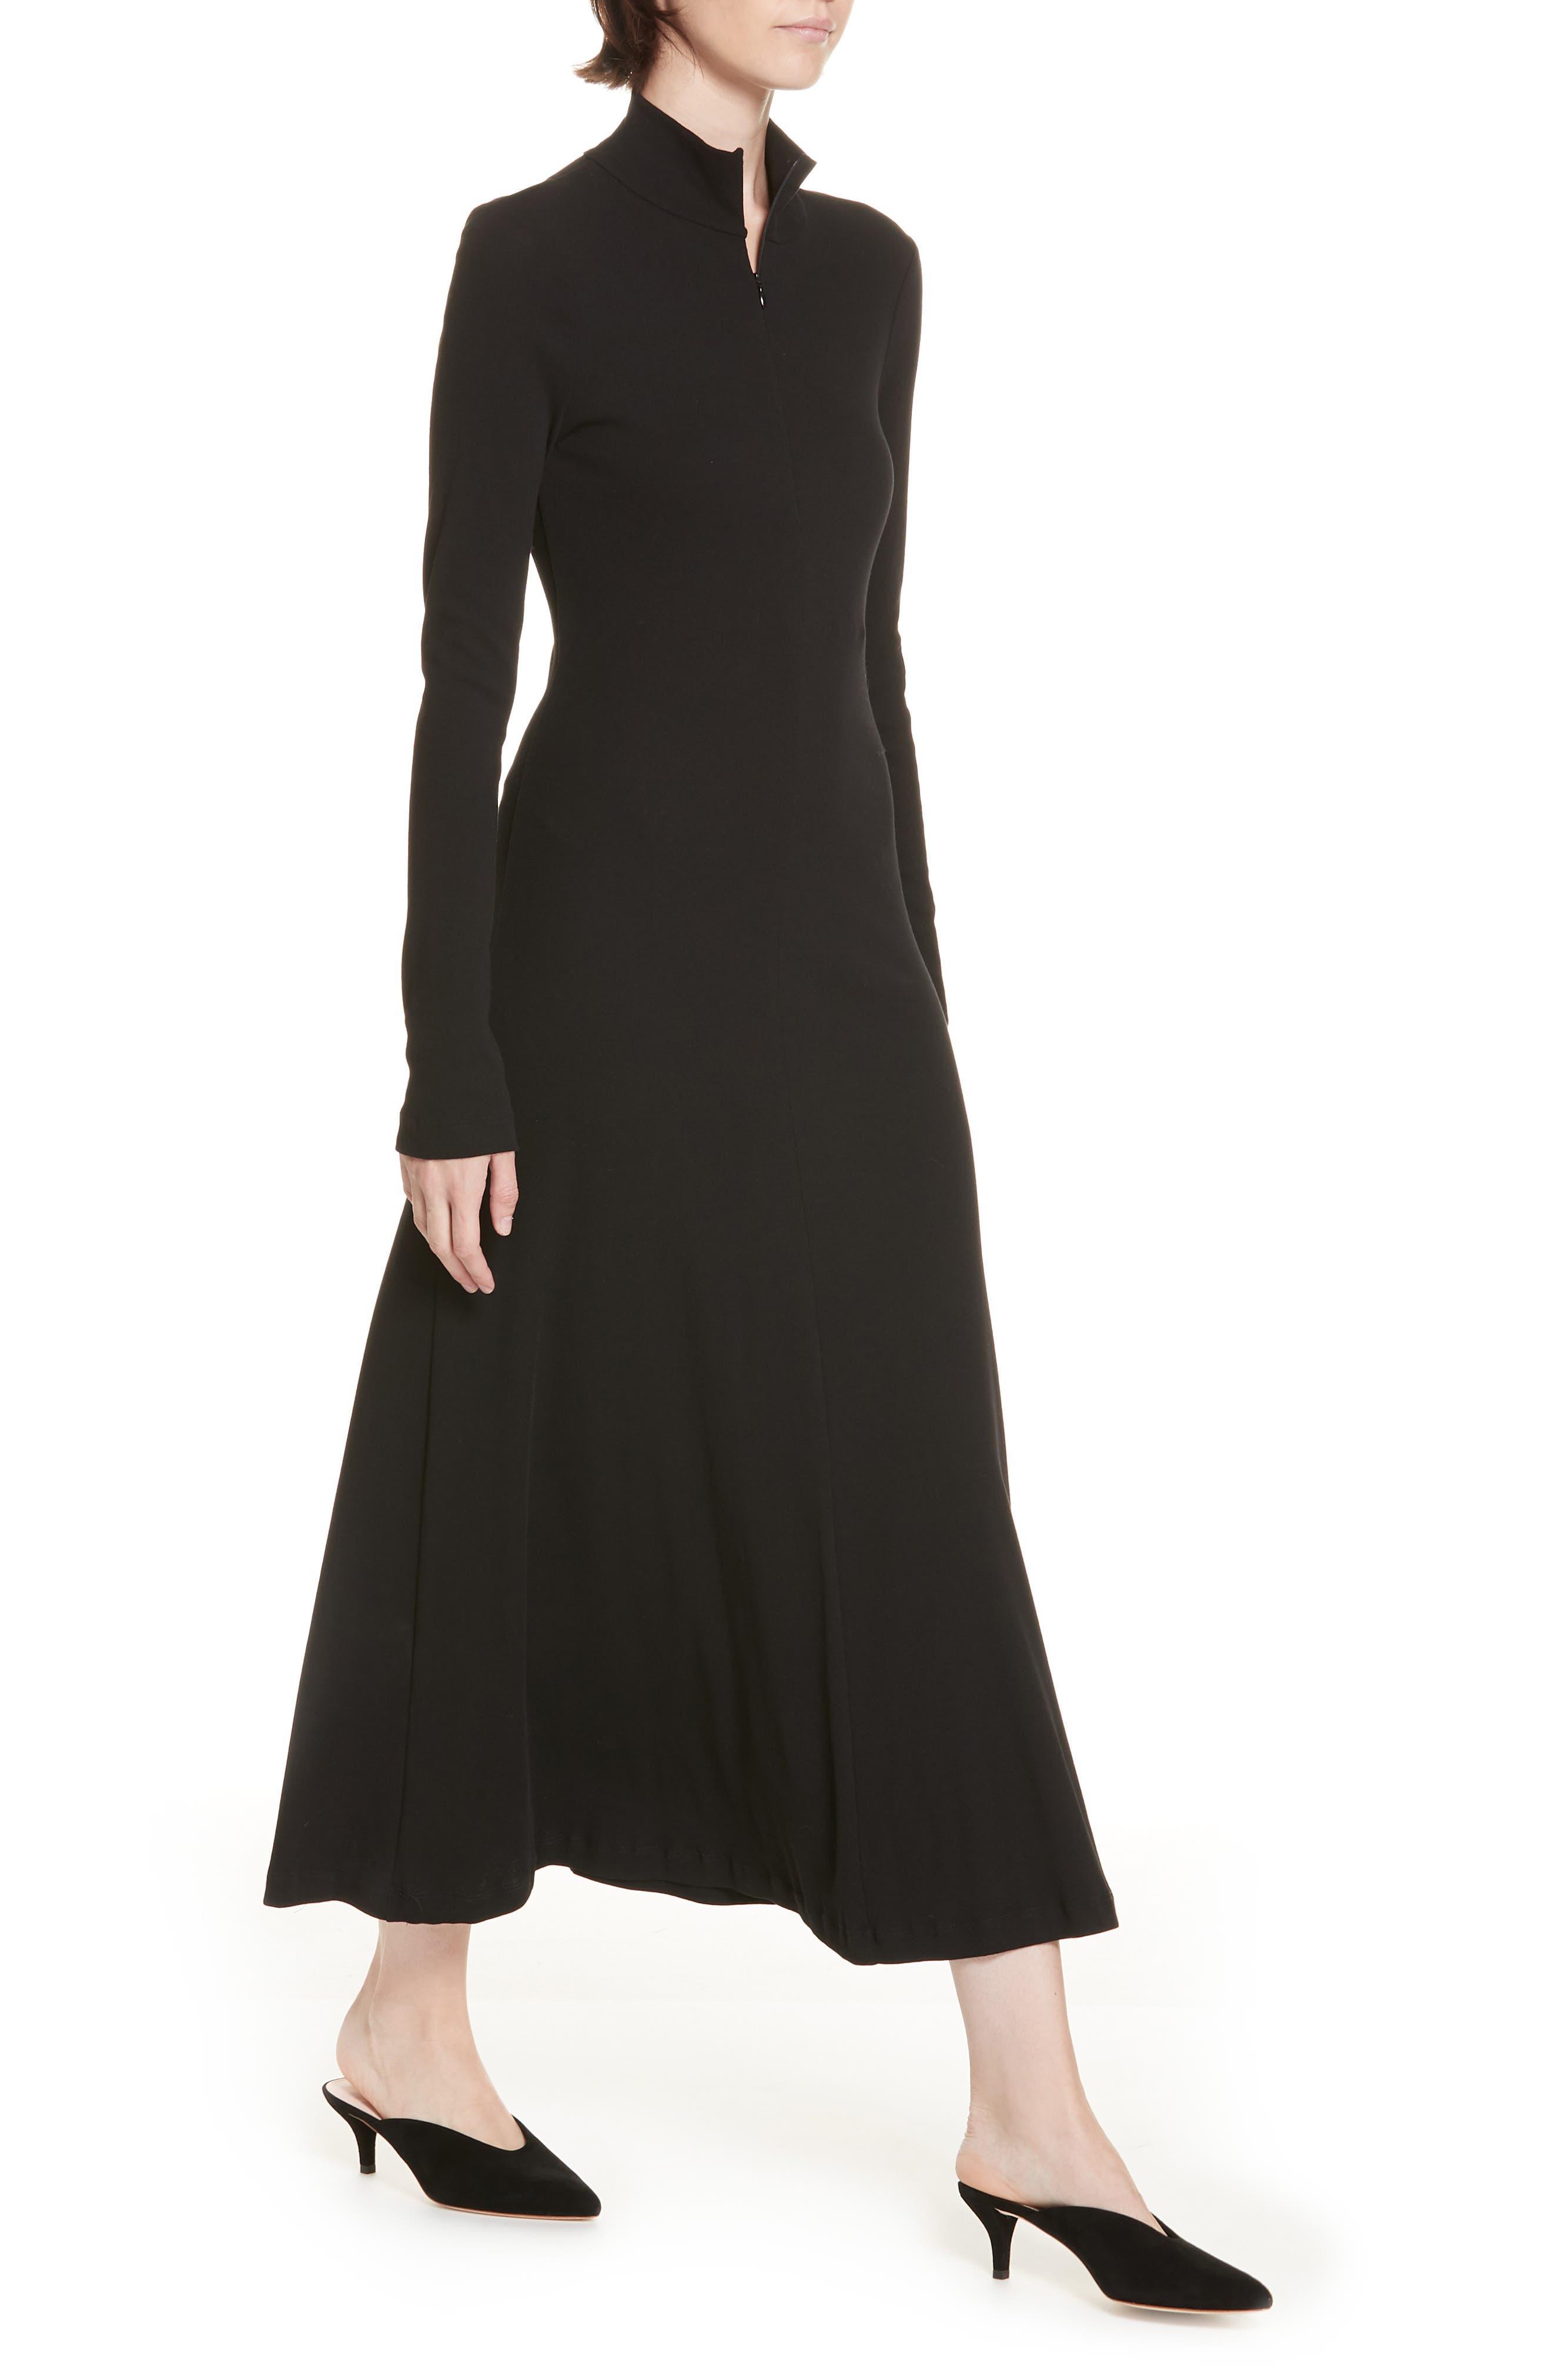 ROSETTA GETTY, Turtleneck Jersey Dress, Alternate thumbnail 4, color, BLACK